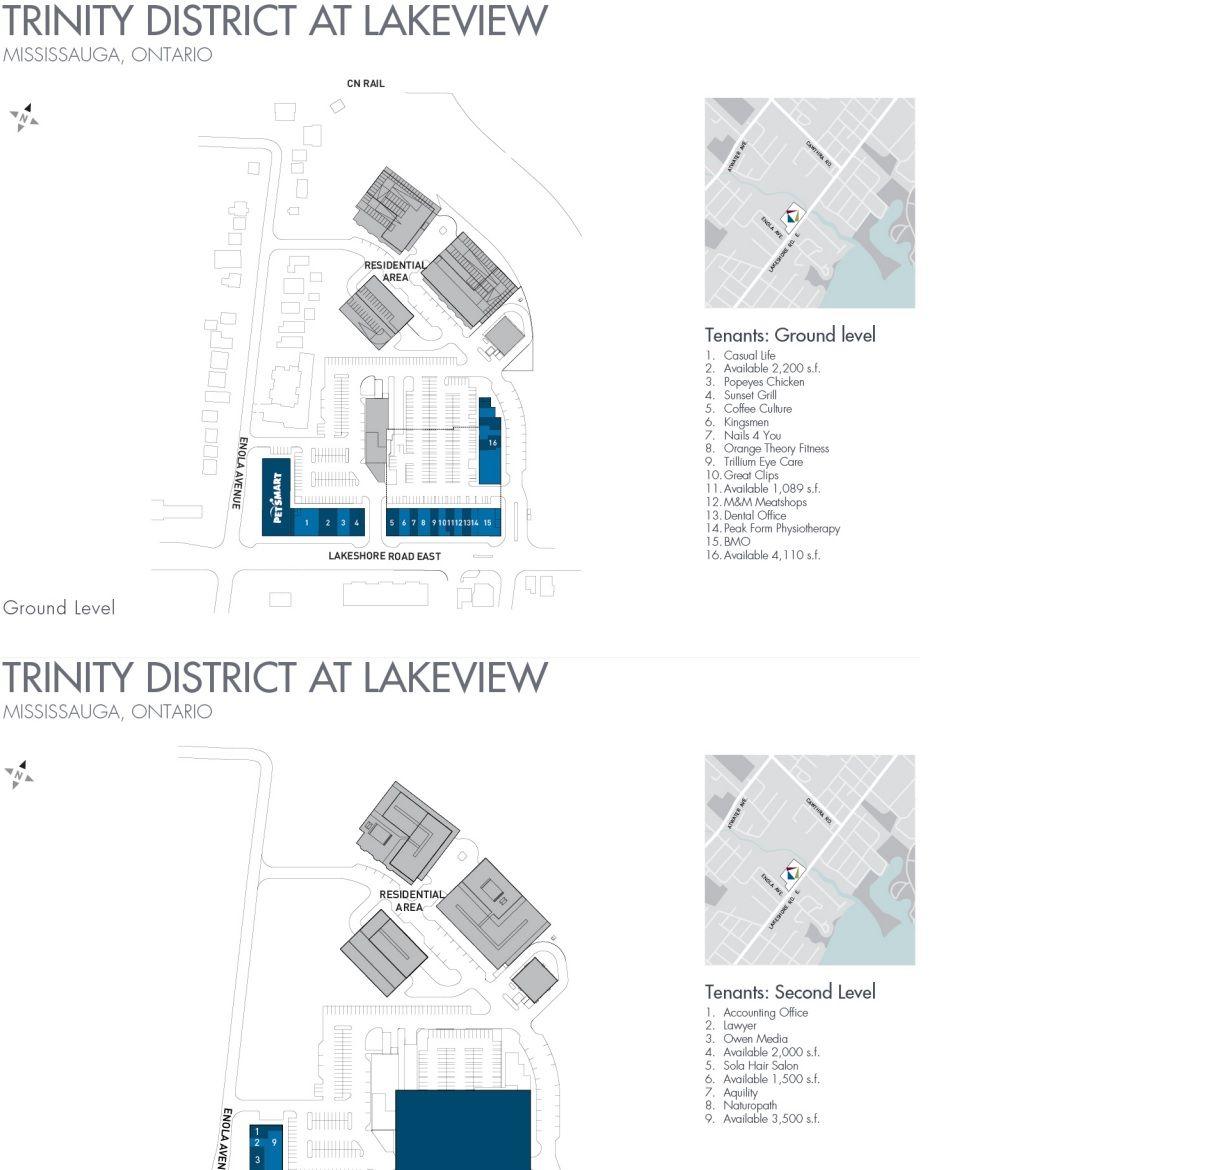 Trinity District at Lakeview shopping plan Lake view